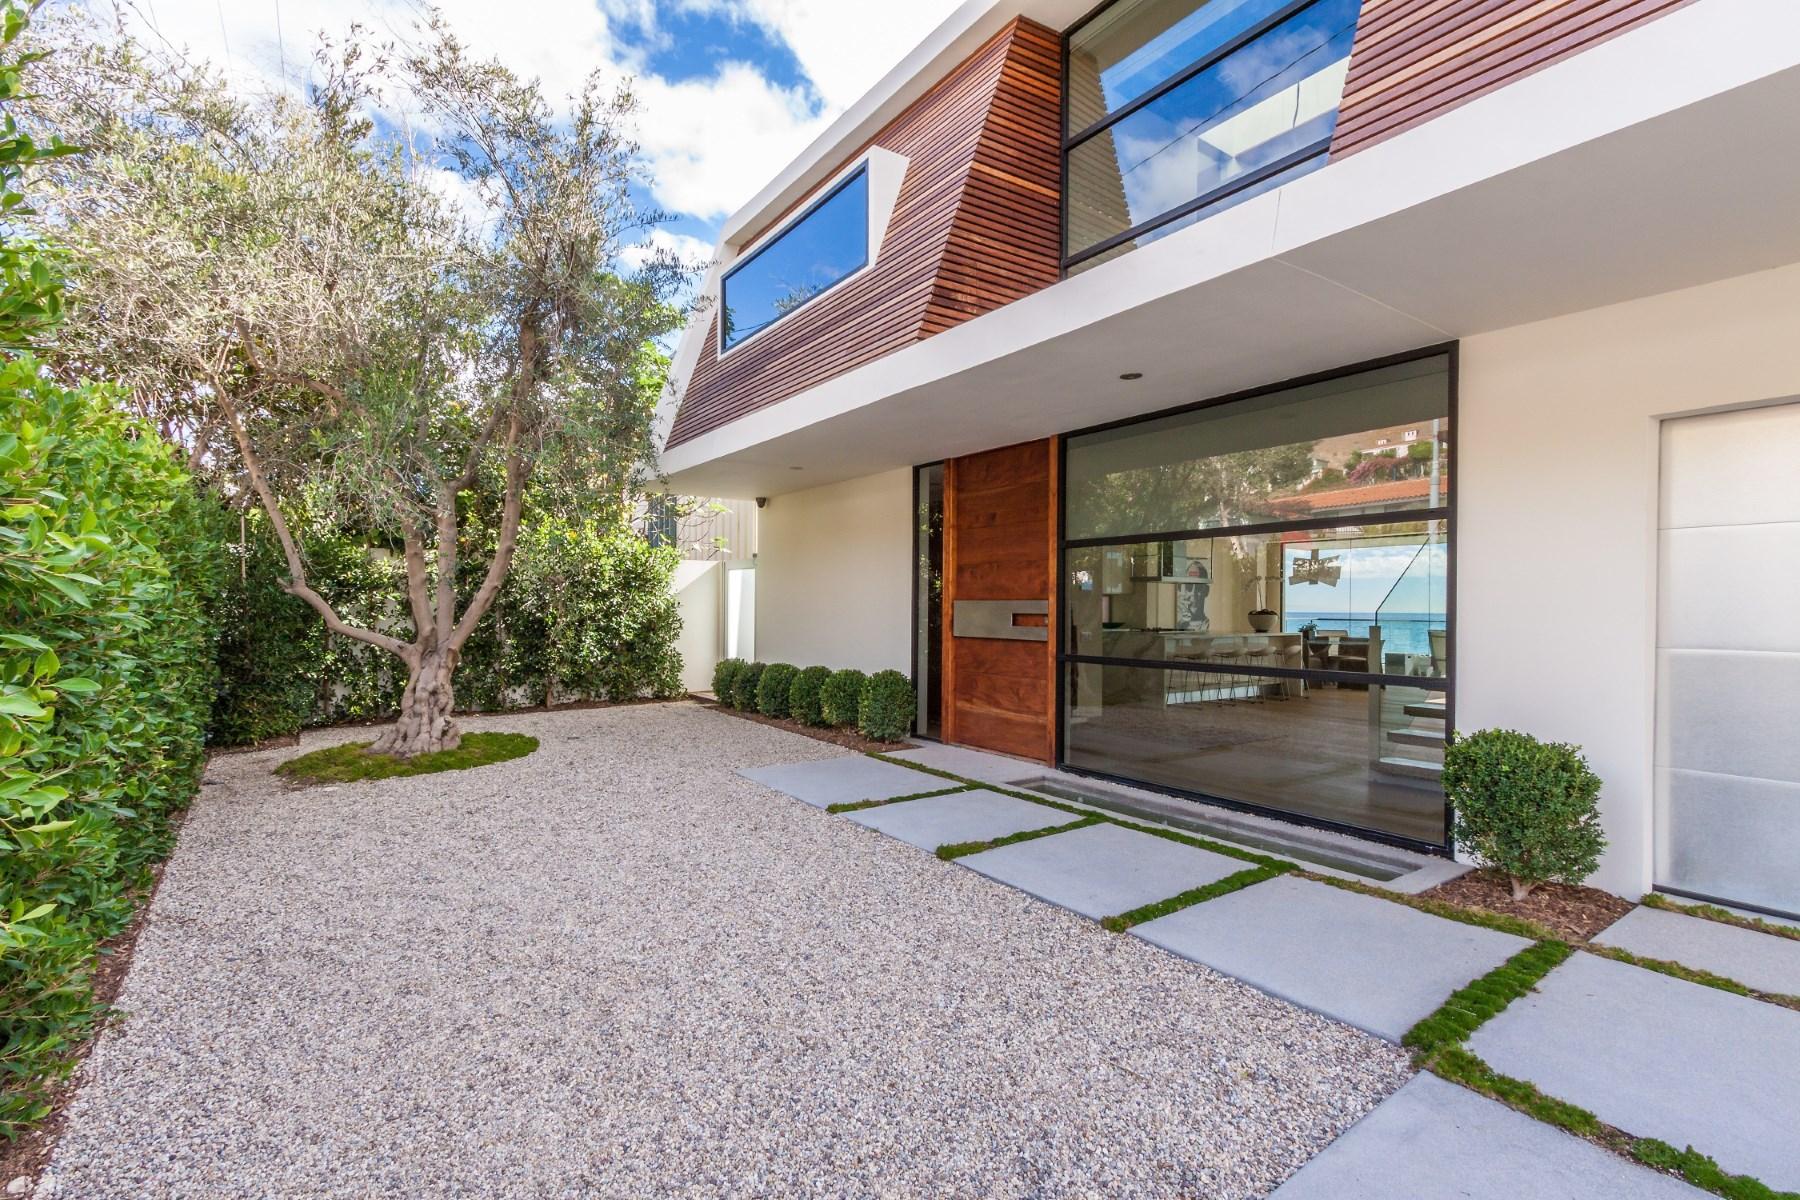 Property For Sale at Rebuilt, Redesigned, Reimagined